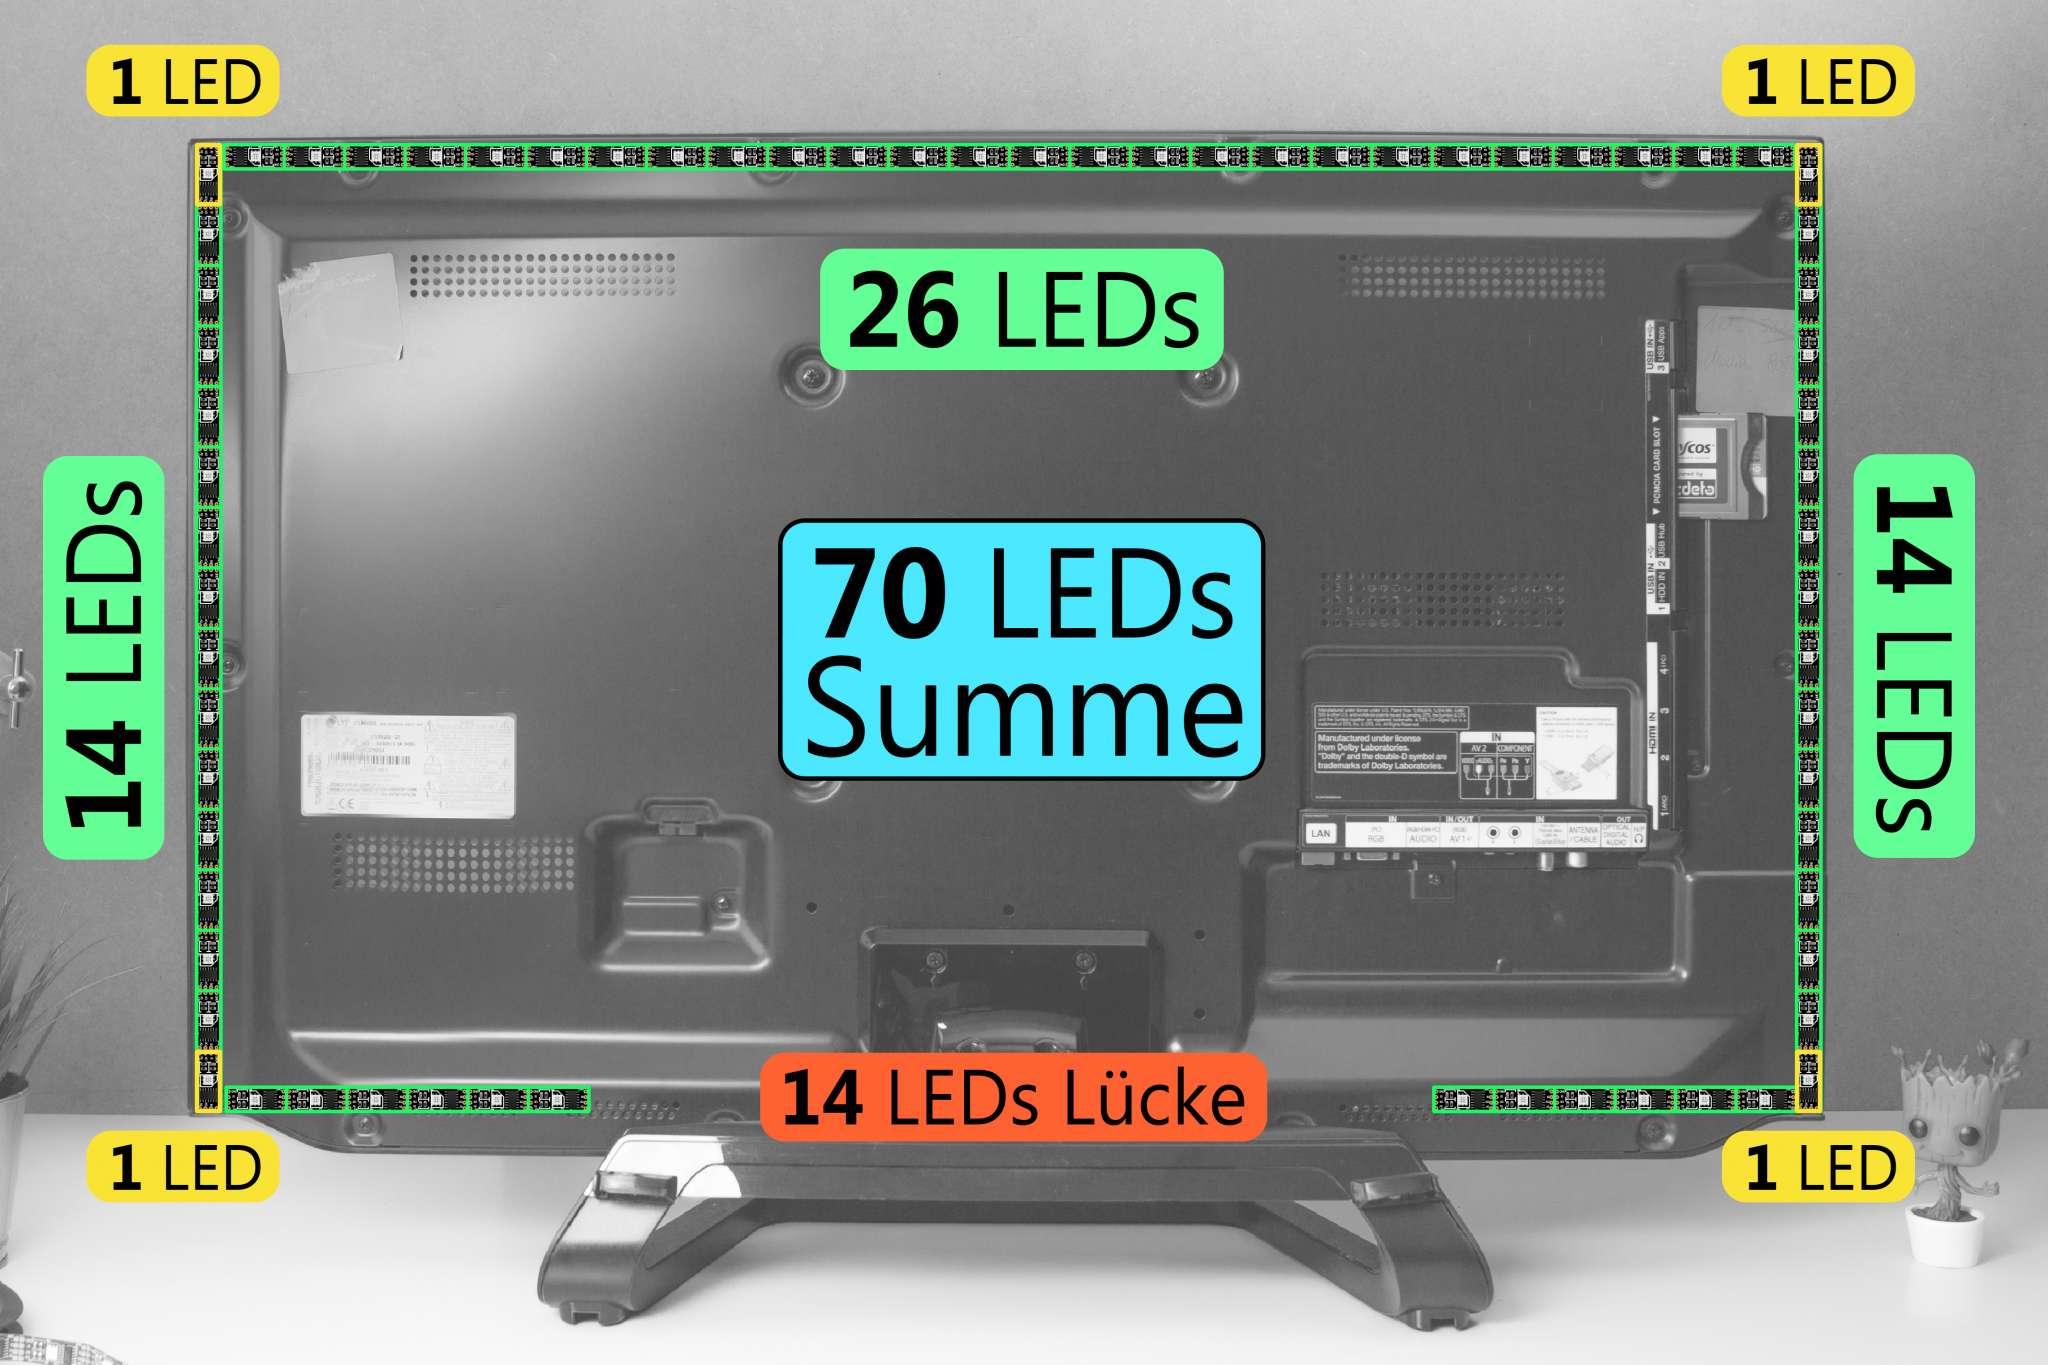 Ambilight Projekt - LEDs zählen